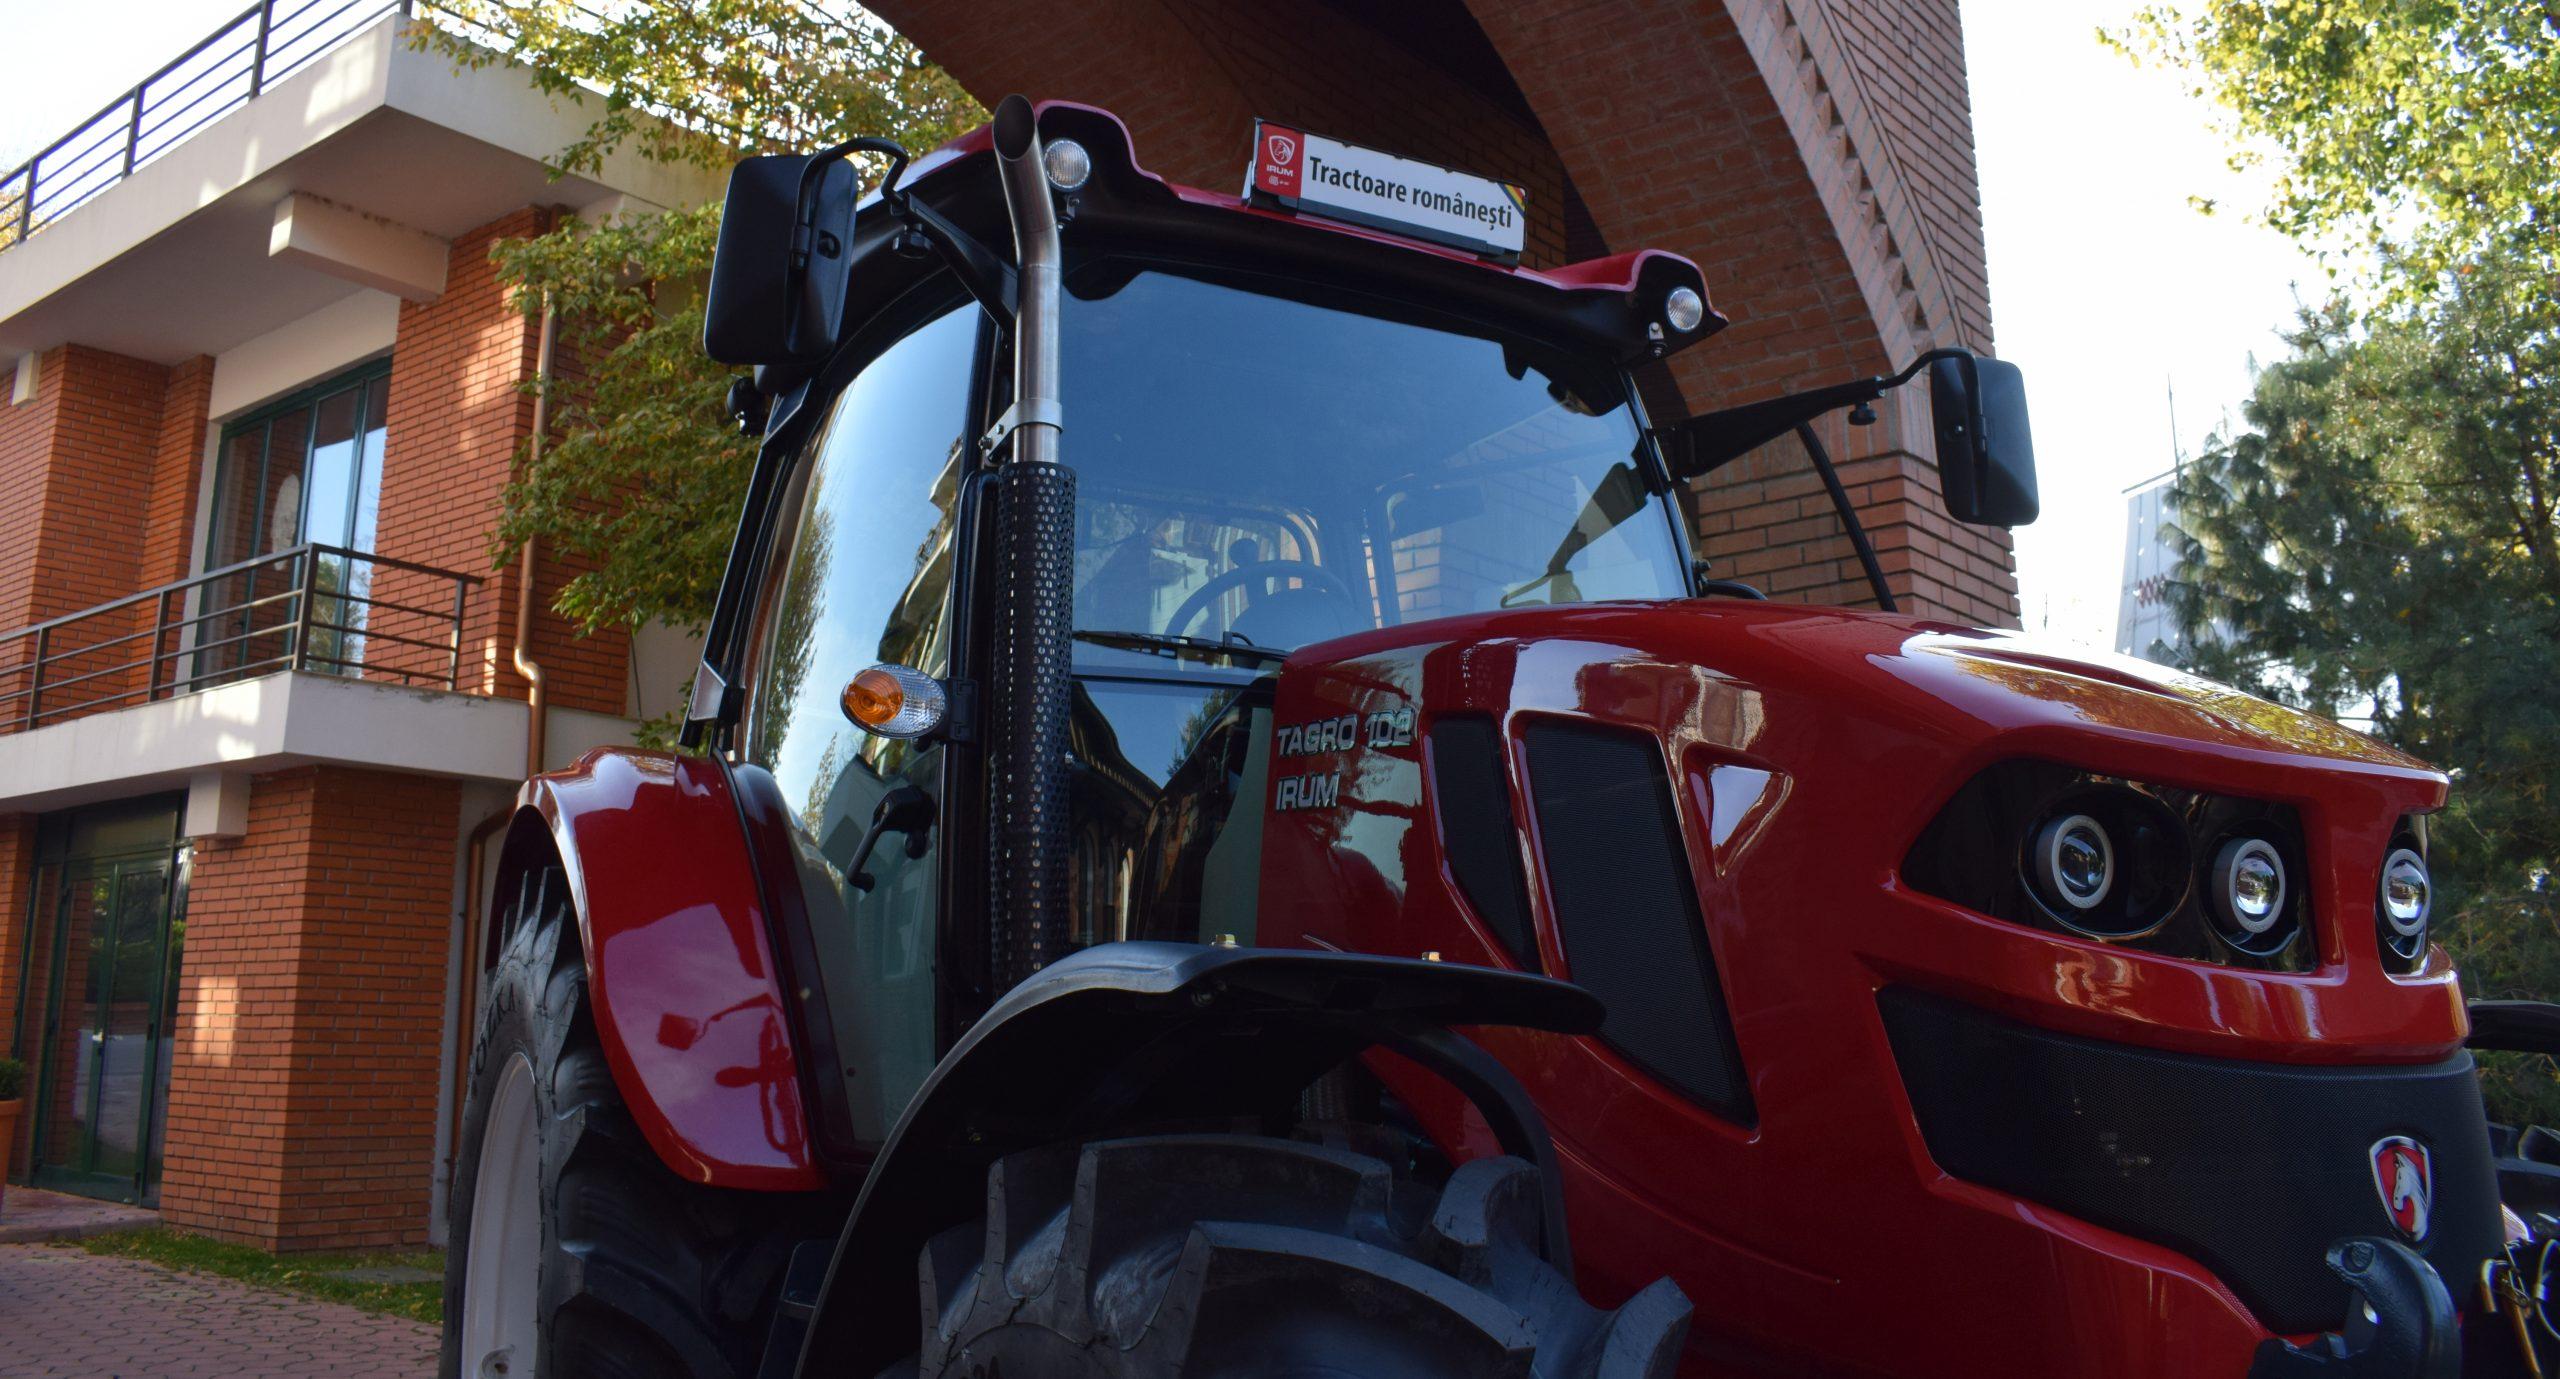 Tractor romanesc Tagro Irum 2